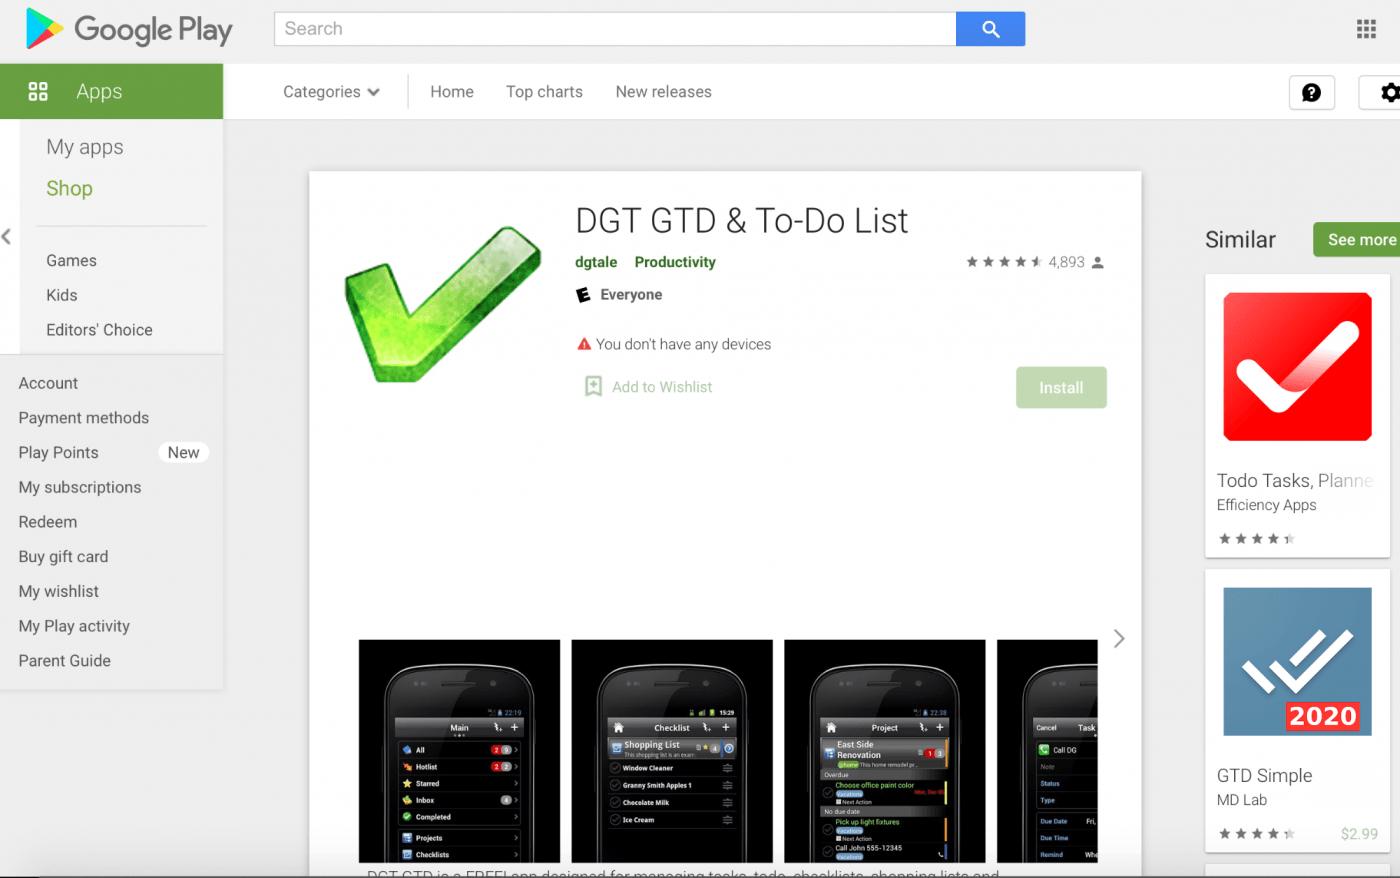 DGT GTD home page